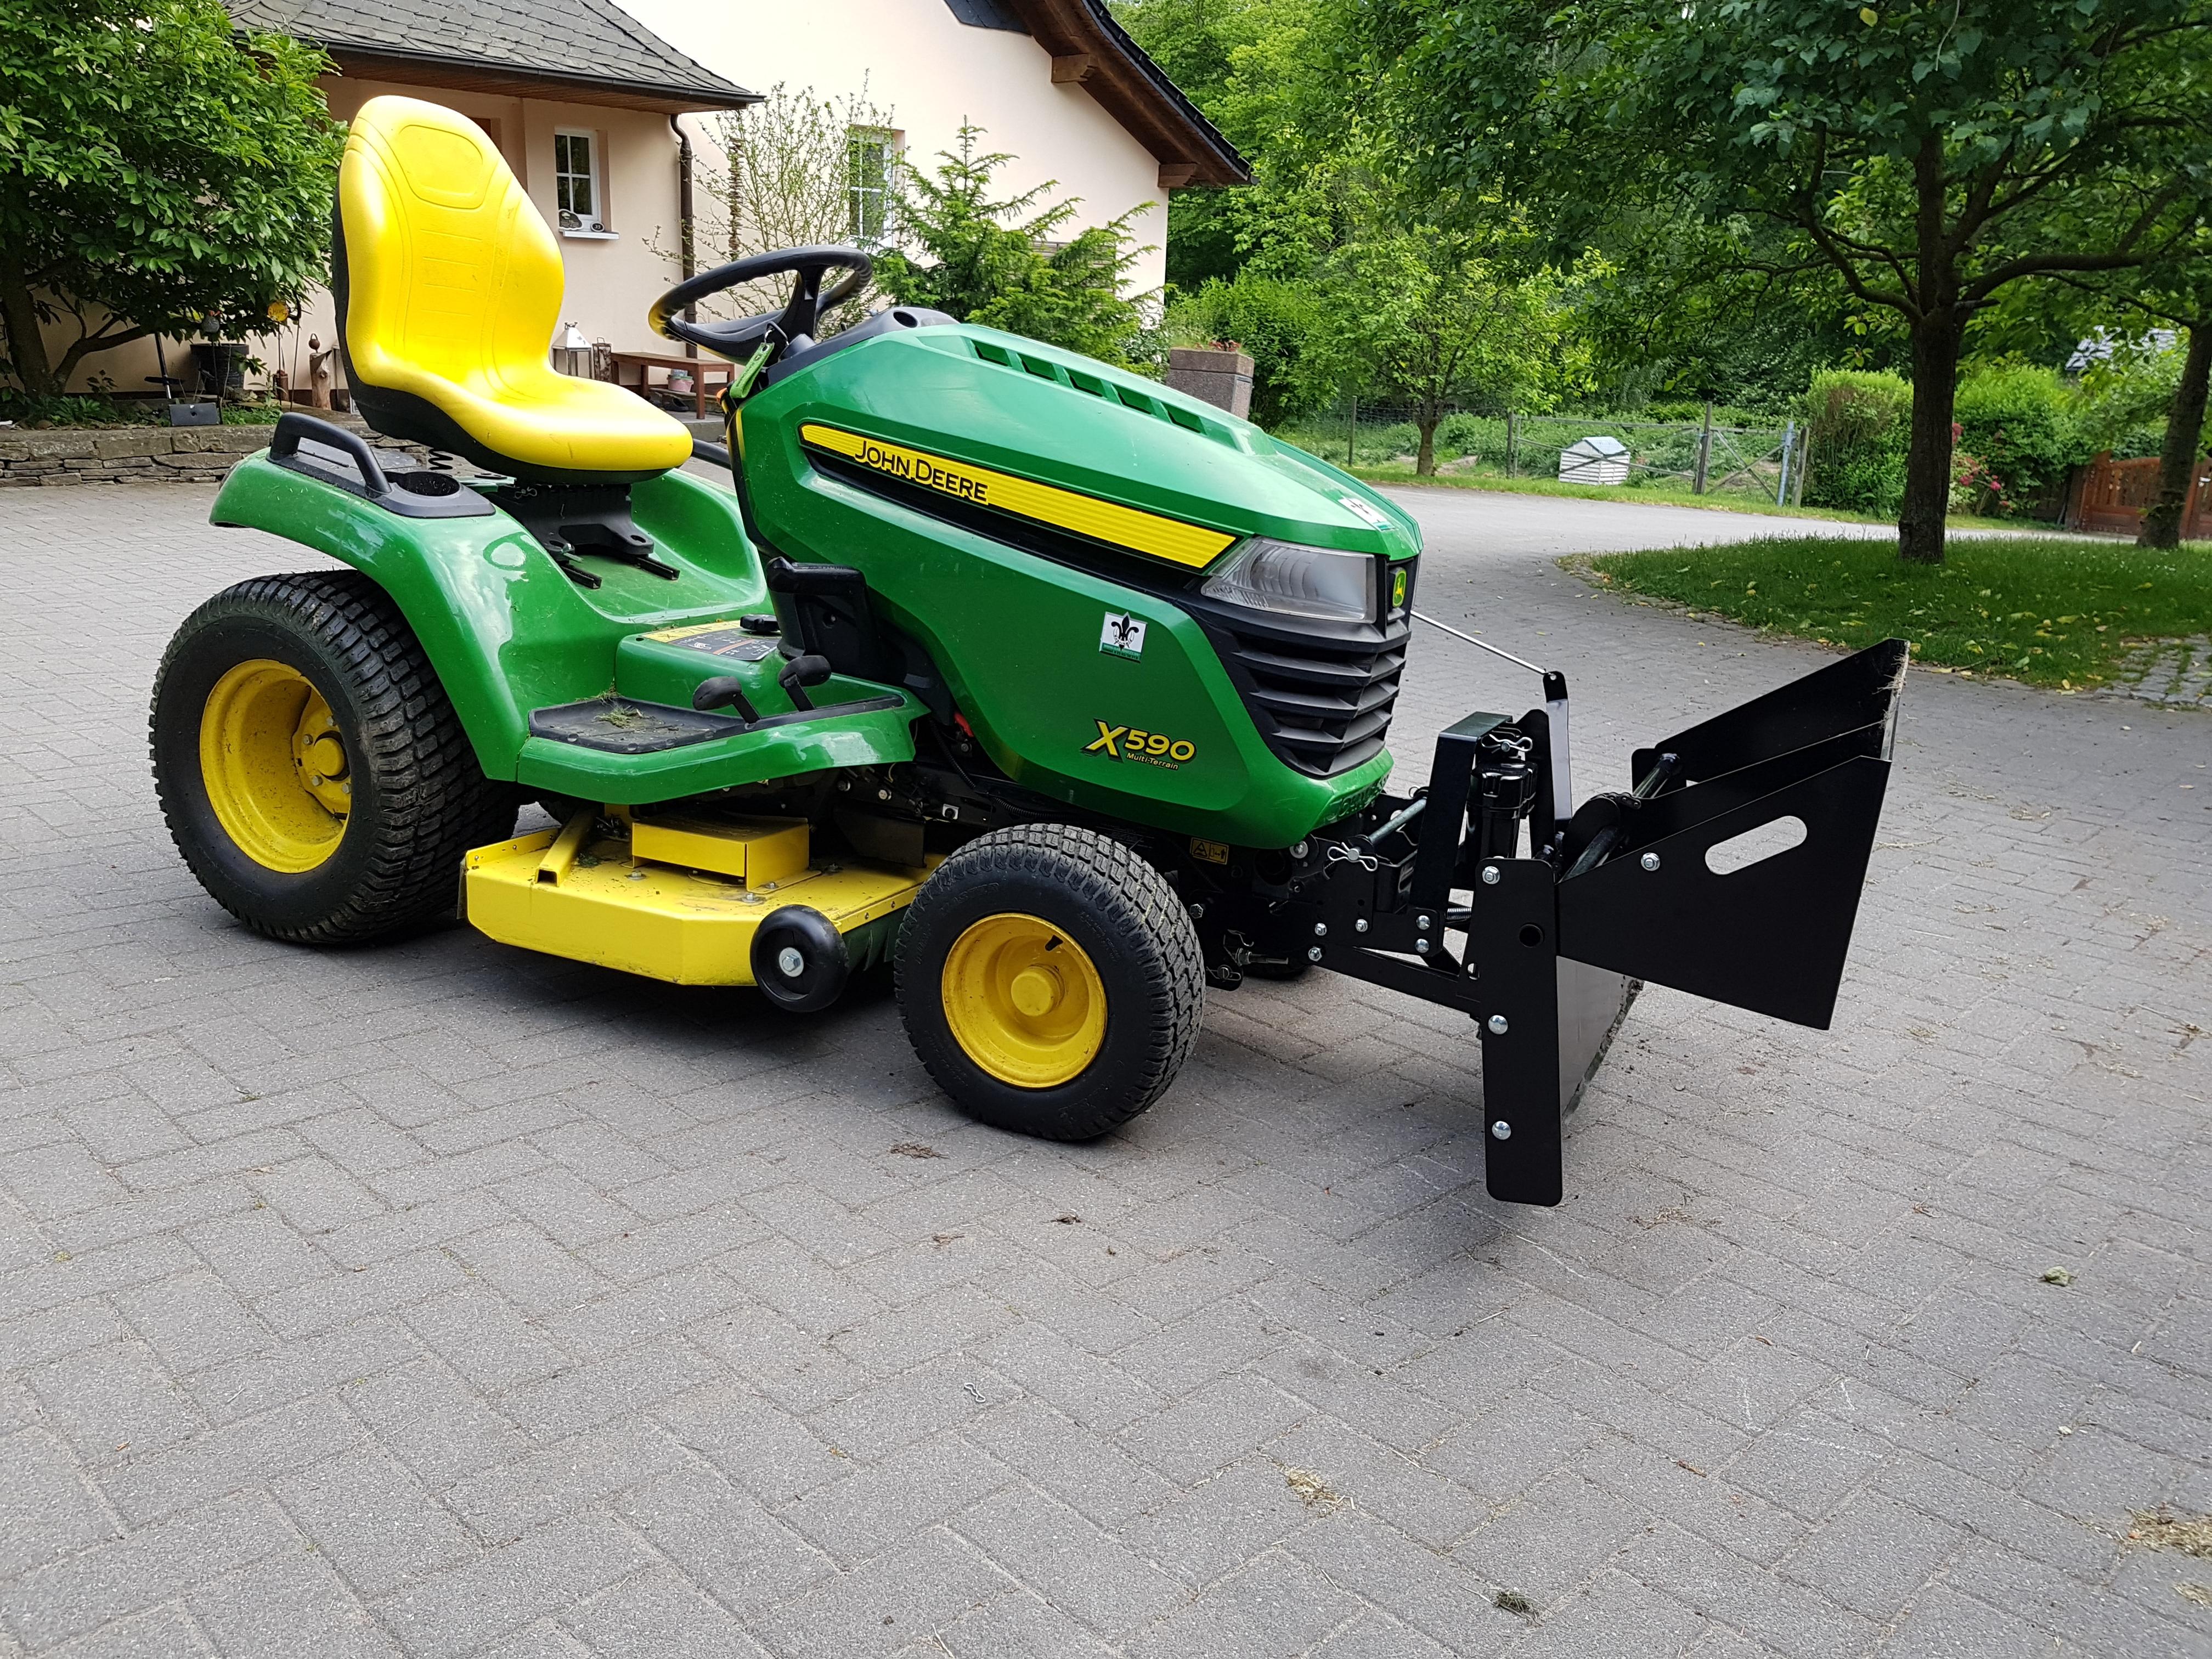 Greenpartstore John Deere Parts And More Parts For >> John Deere 40 Inch Tractor Shovel Lp63767